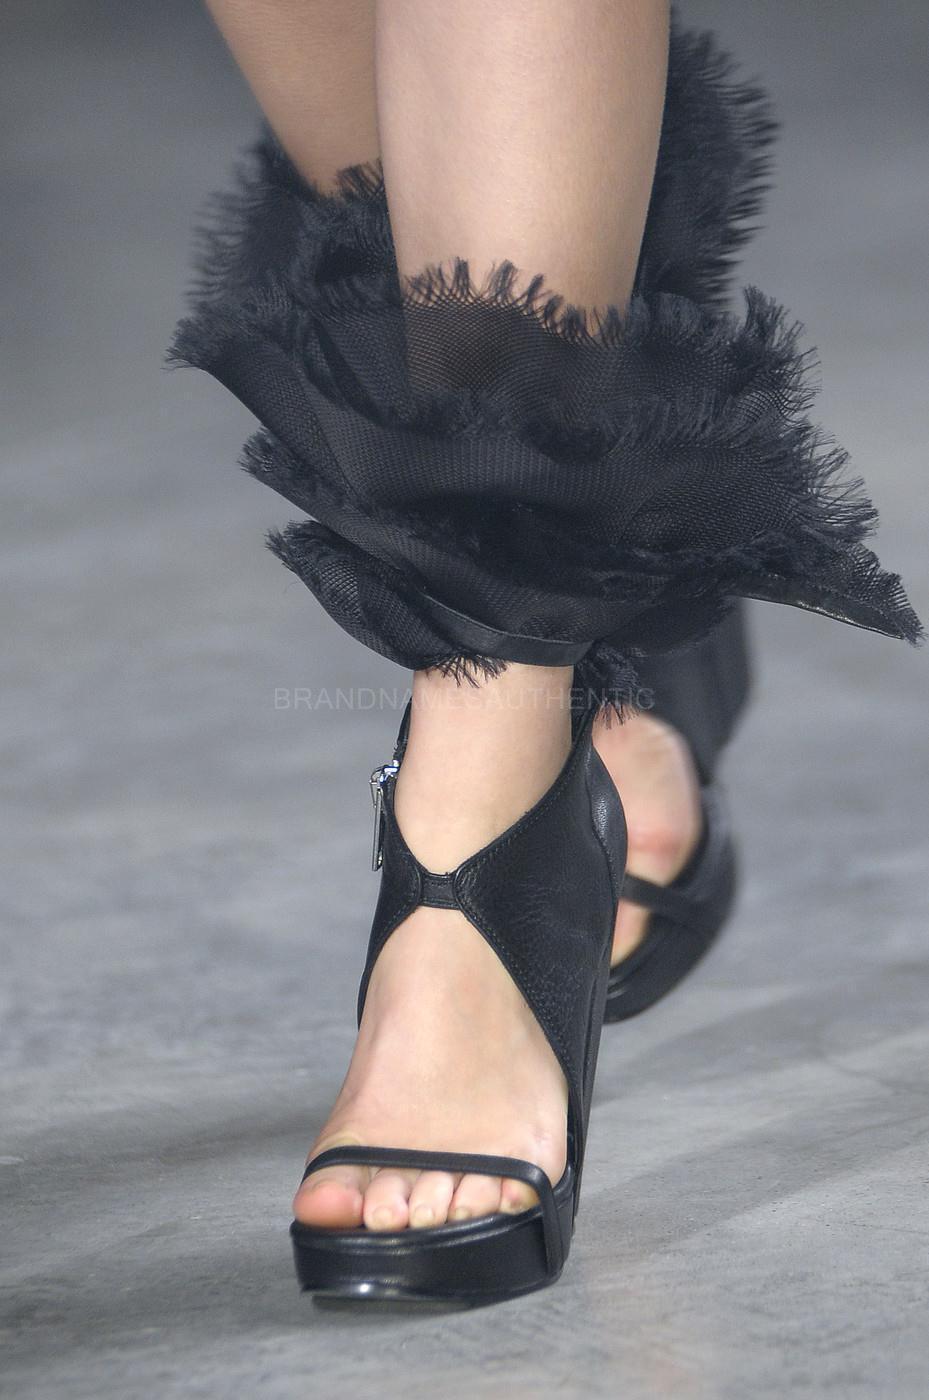 Rick Owens Runway Organza Wedge Sandals scarpe scarpe scarpe Dimensione 39,5  2425 fe4e64